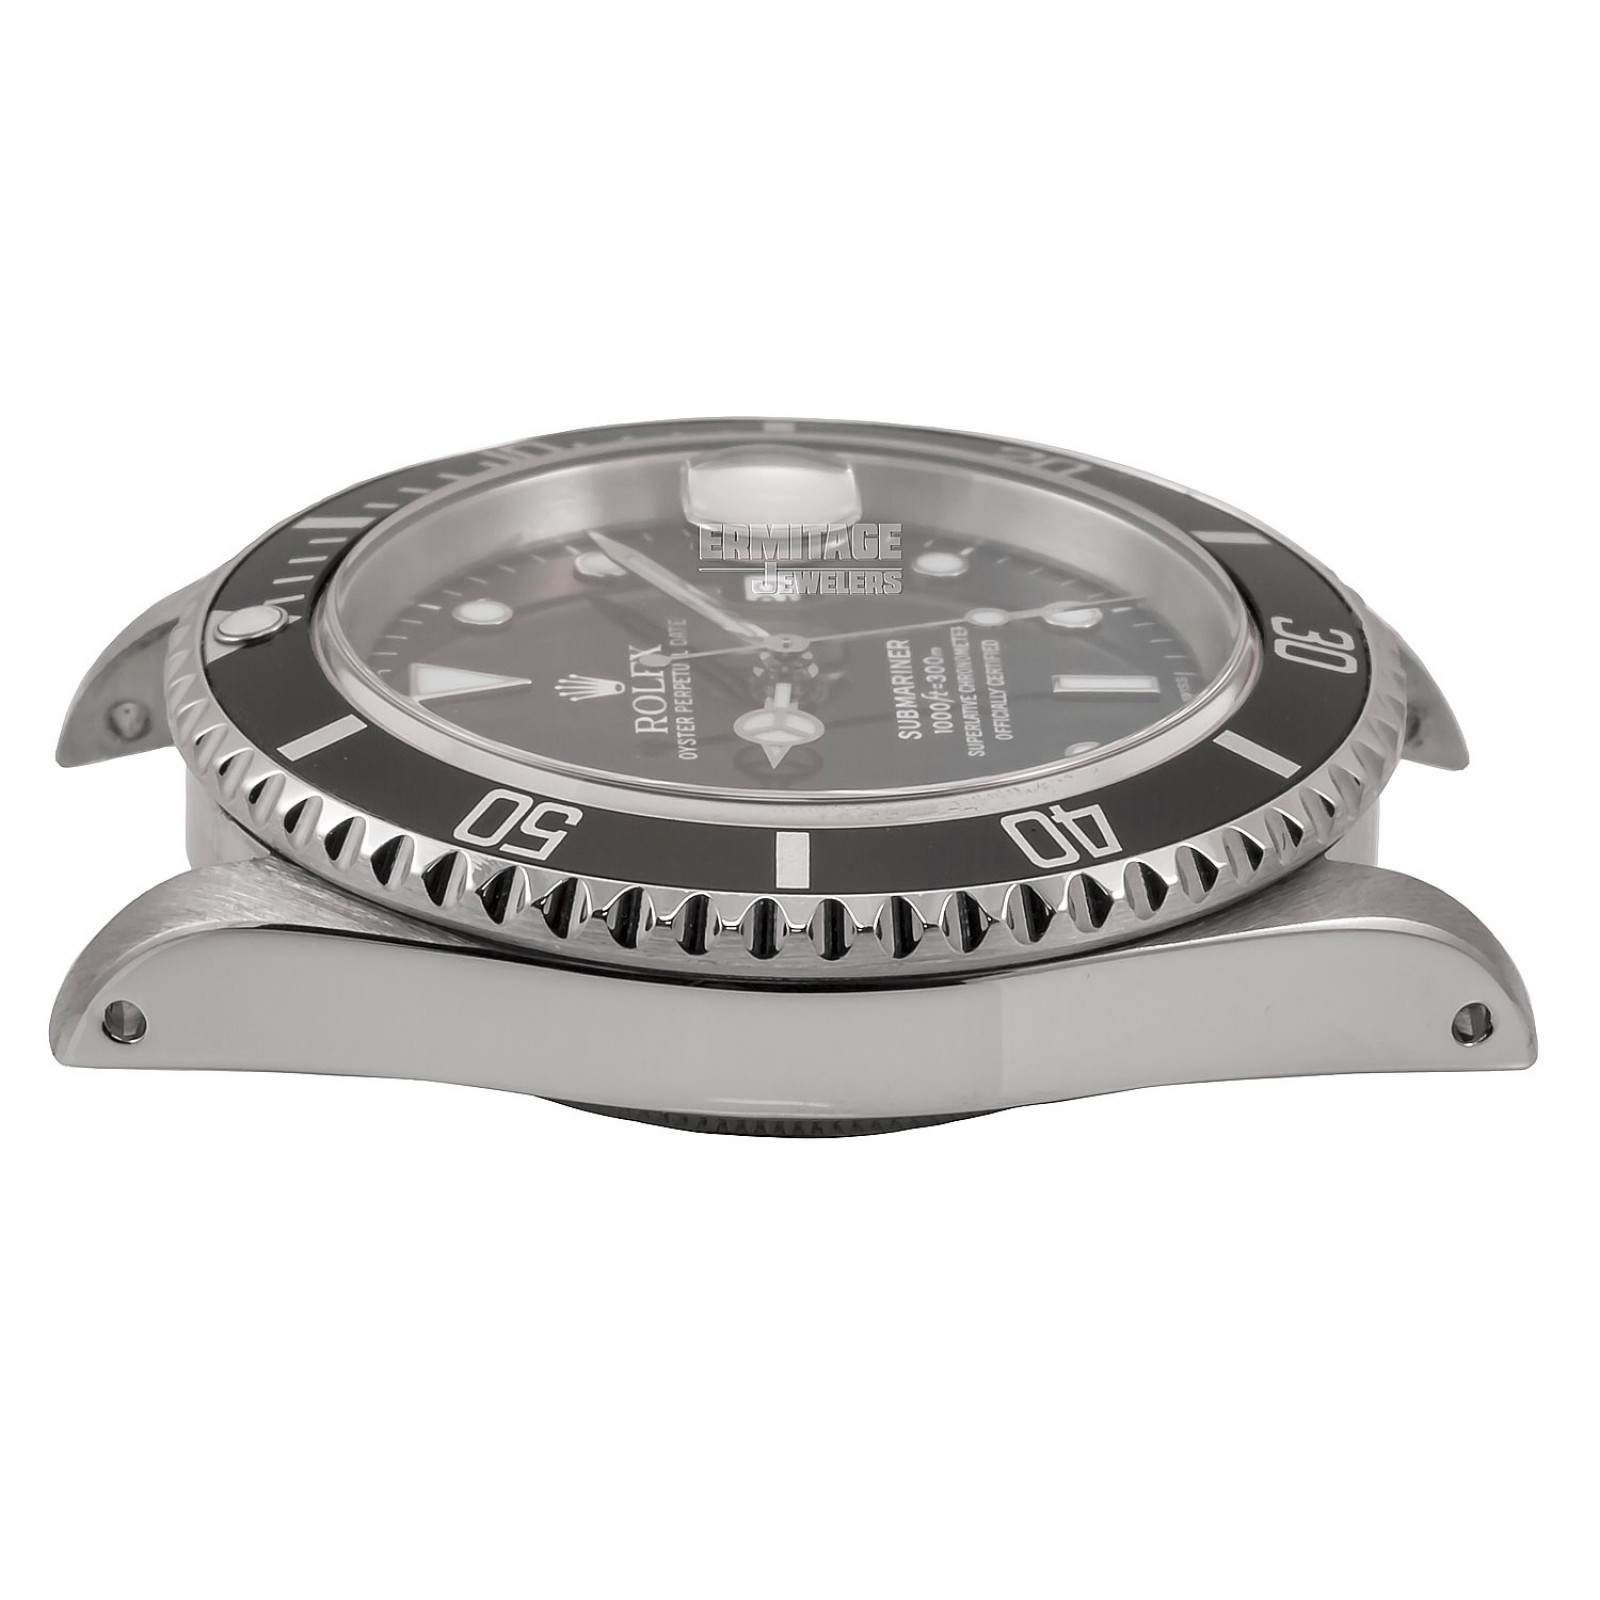 Rolex Submariner 16610 Single Swiss Dial